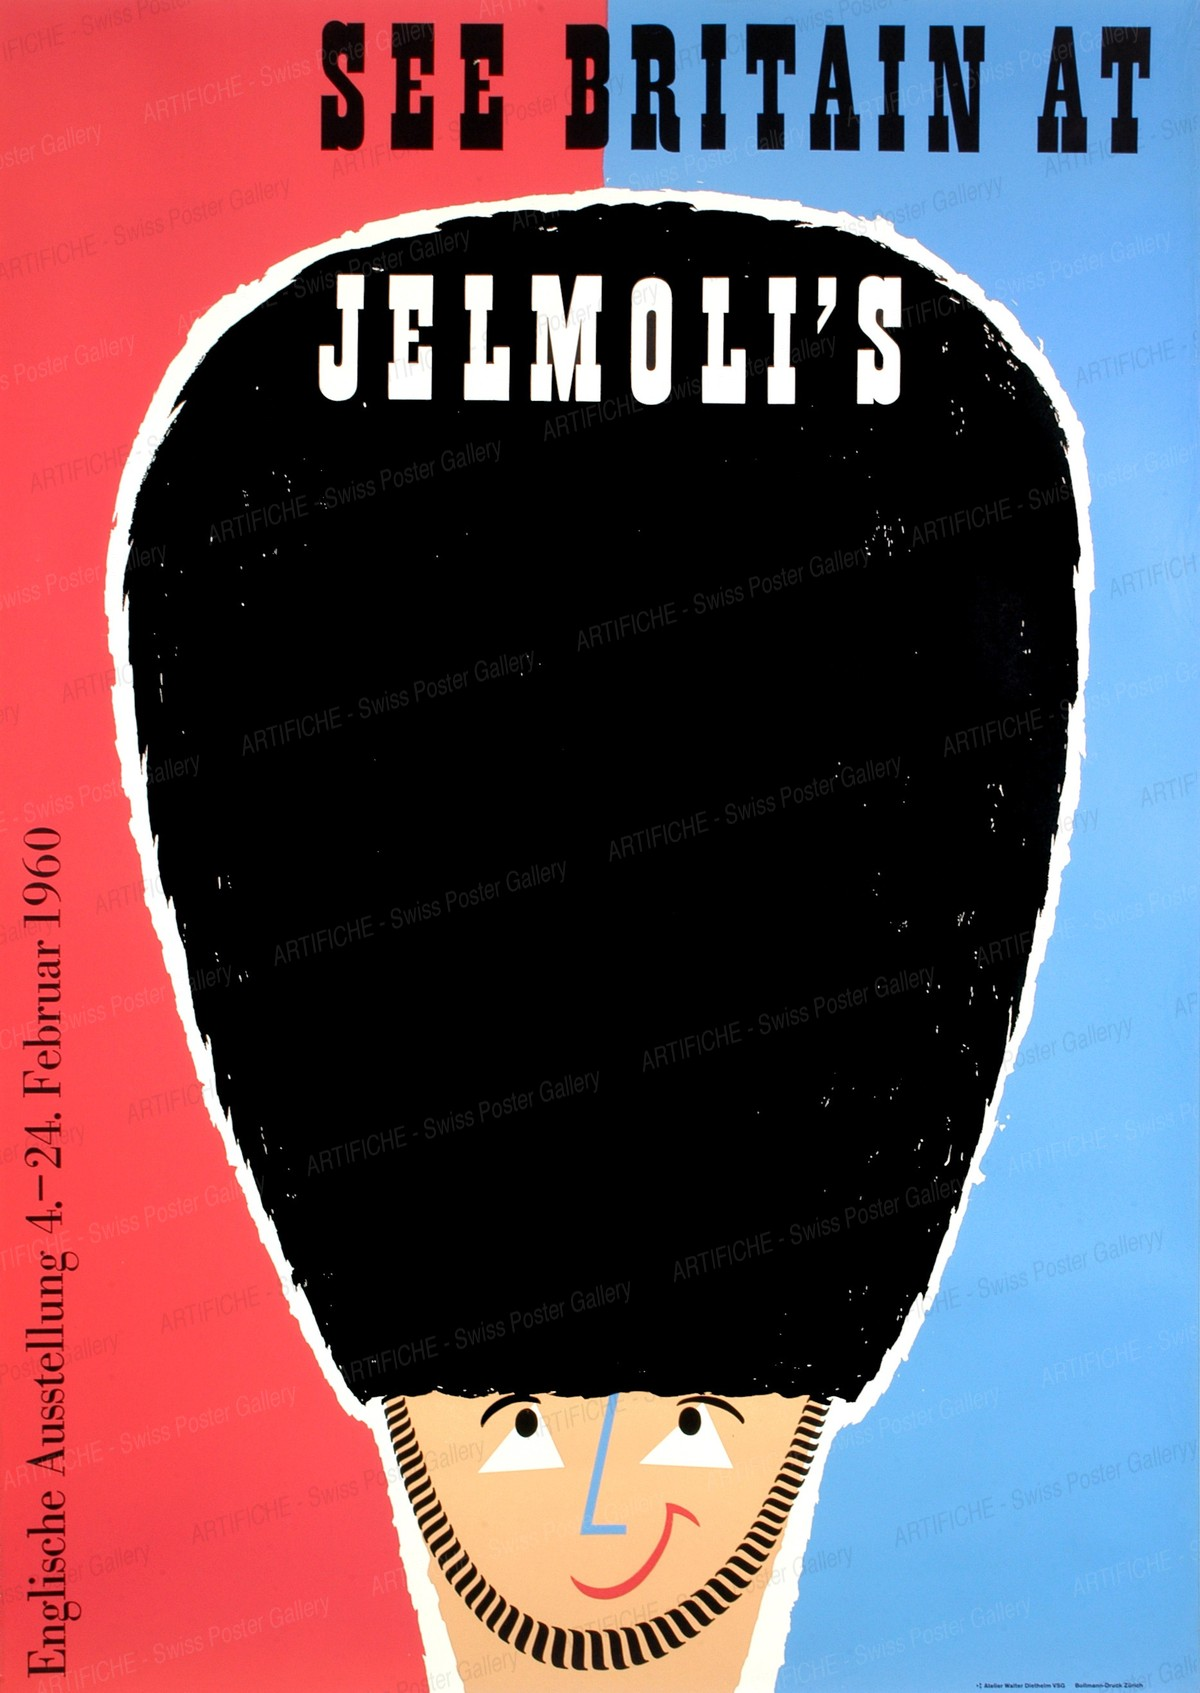 Jelmoli – See Britain at Jelmoli's 1960, Walter Diethelm